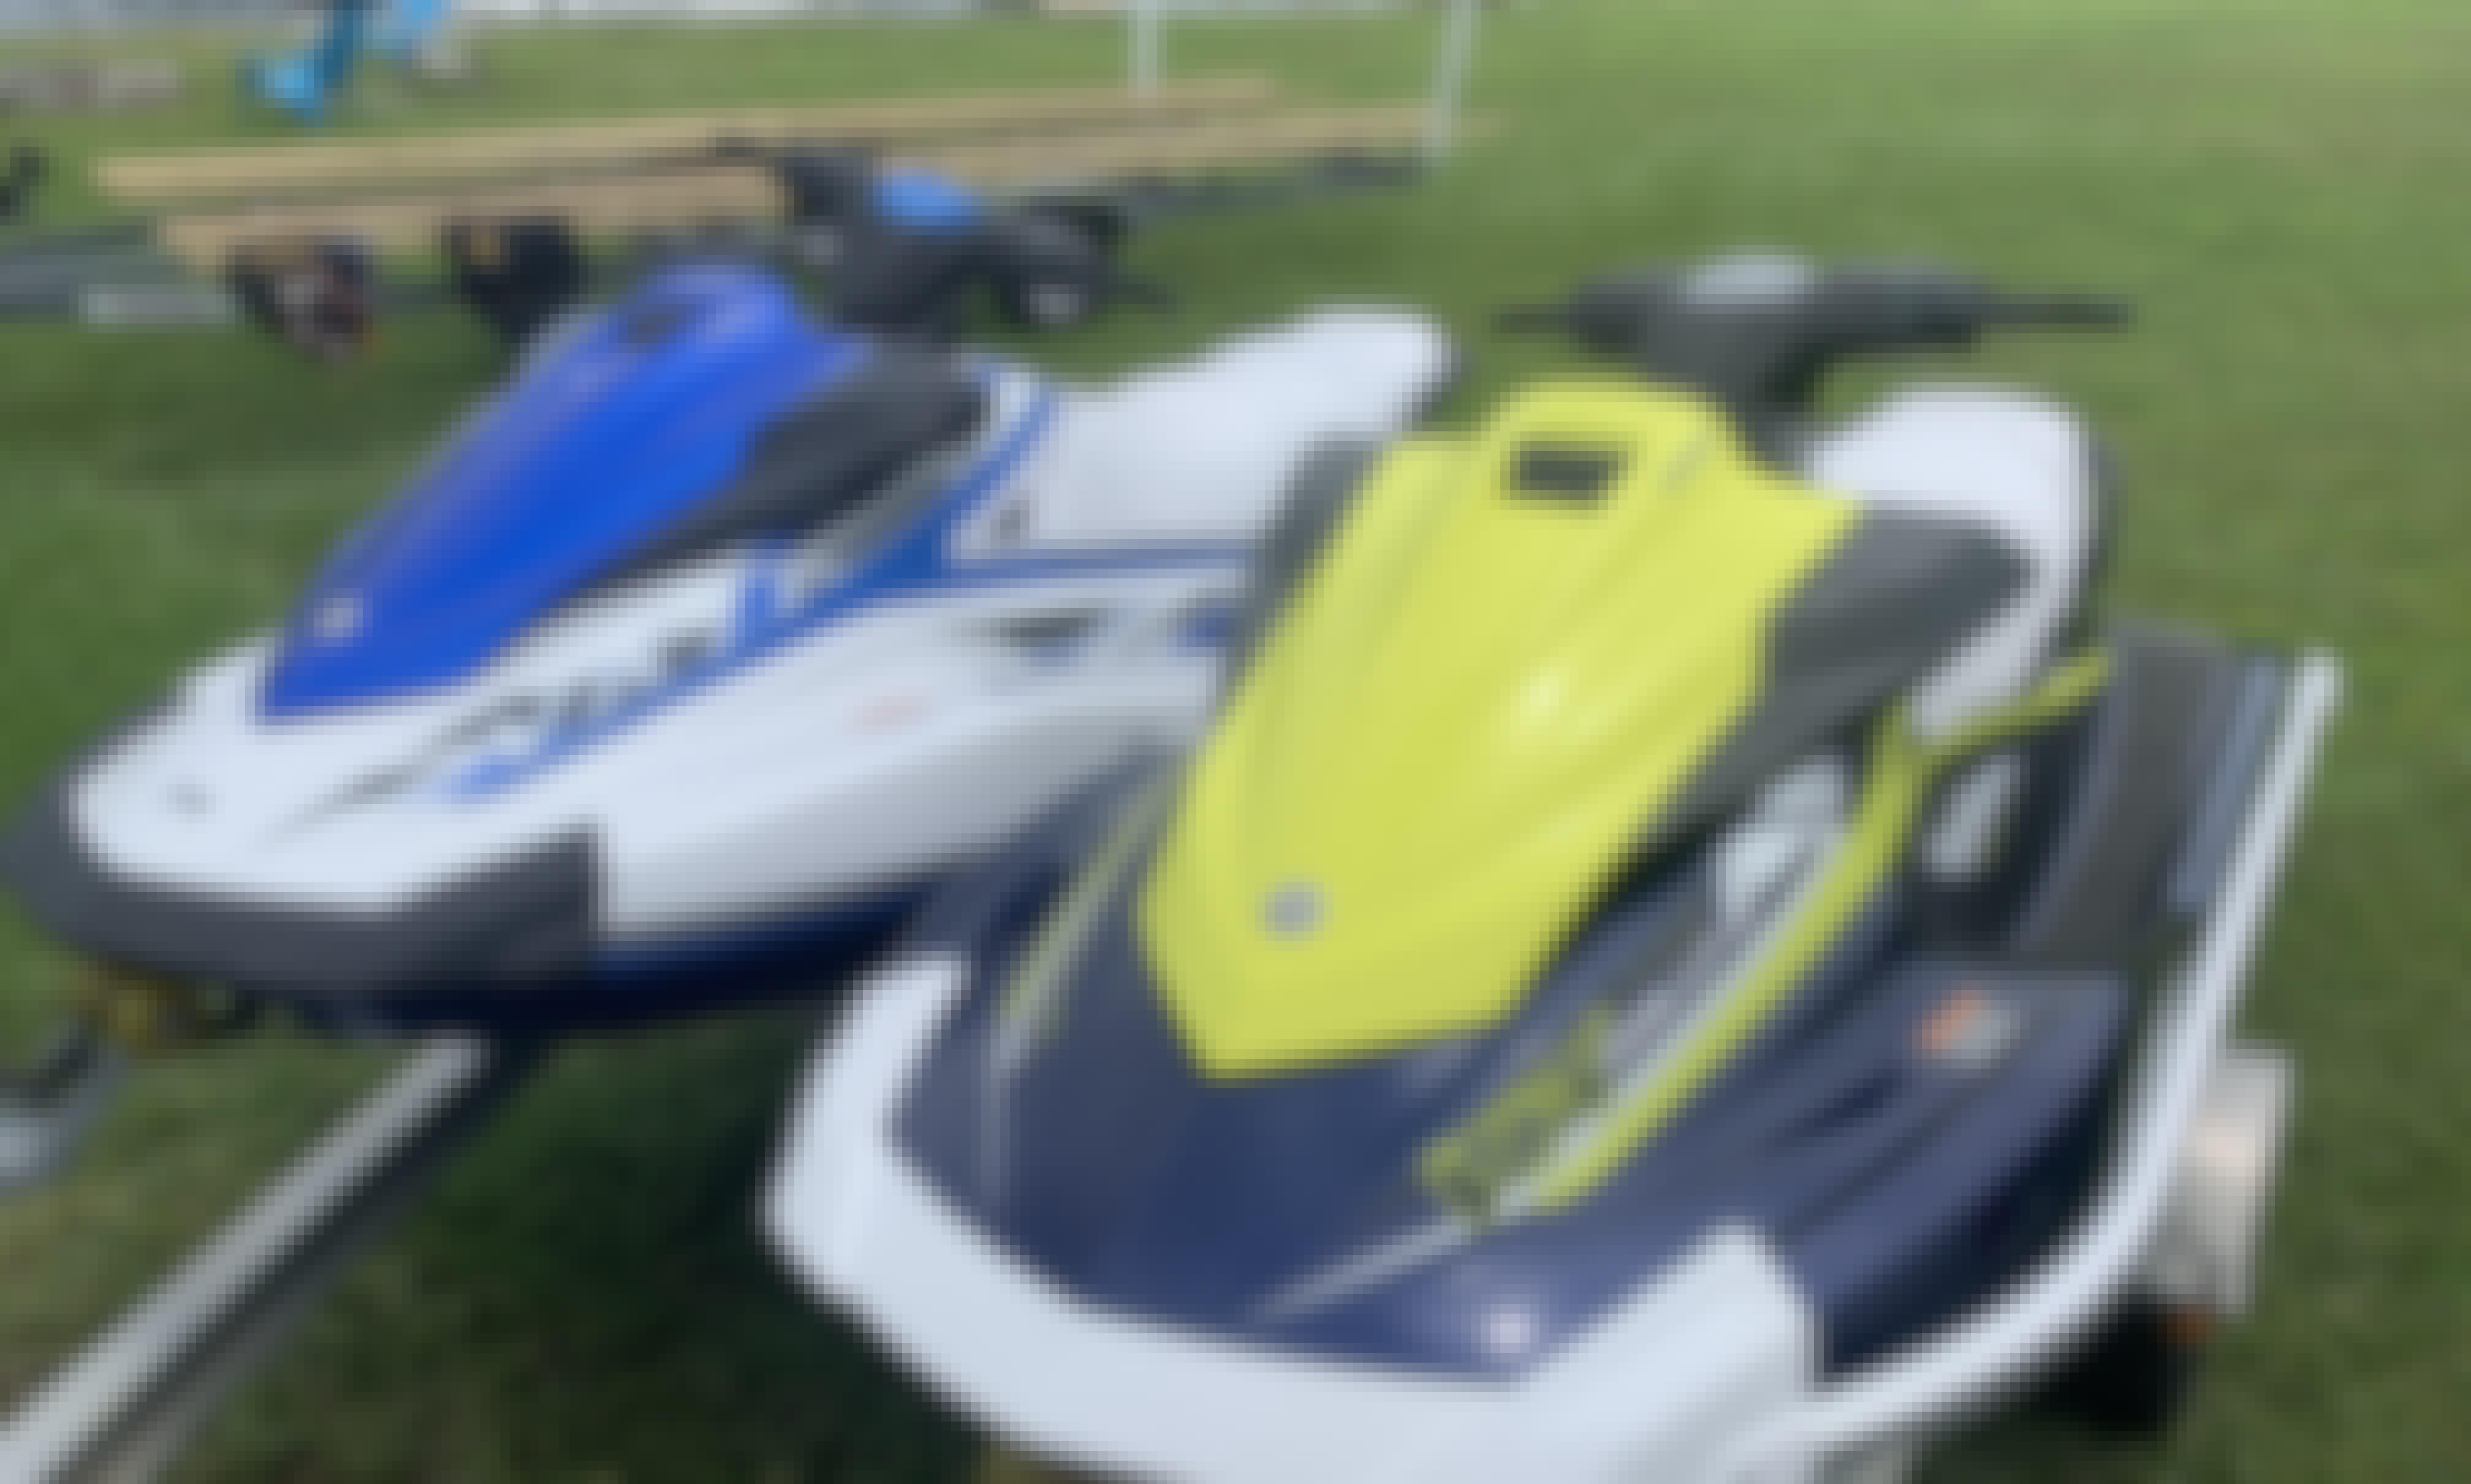 2020 Yamaha Jet Skis delivered in SWFL